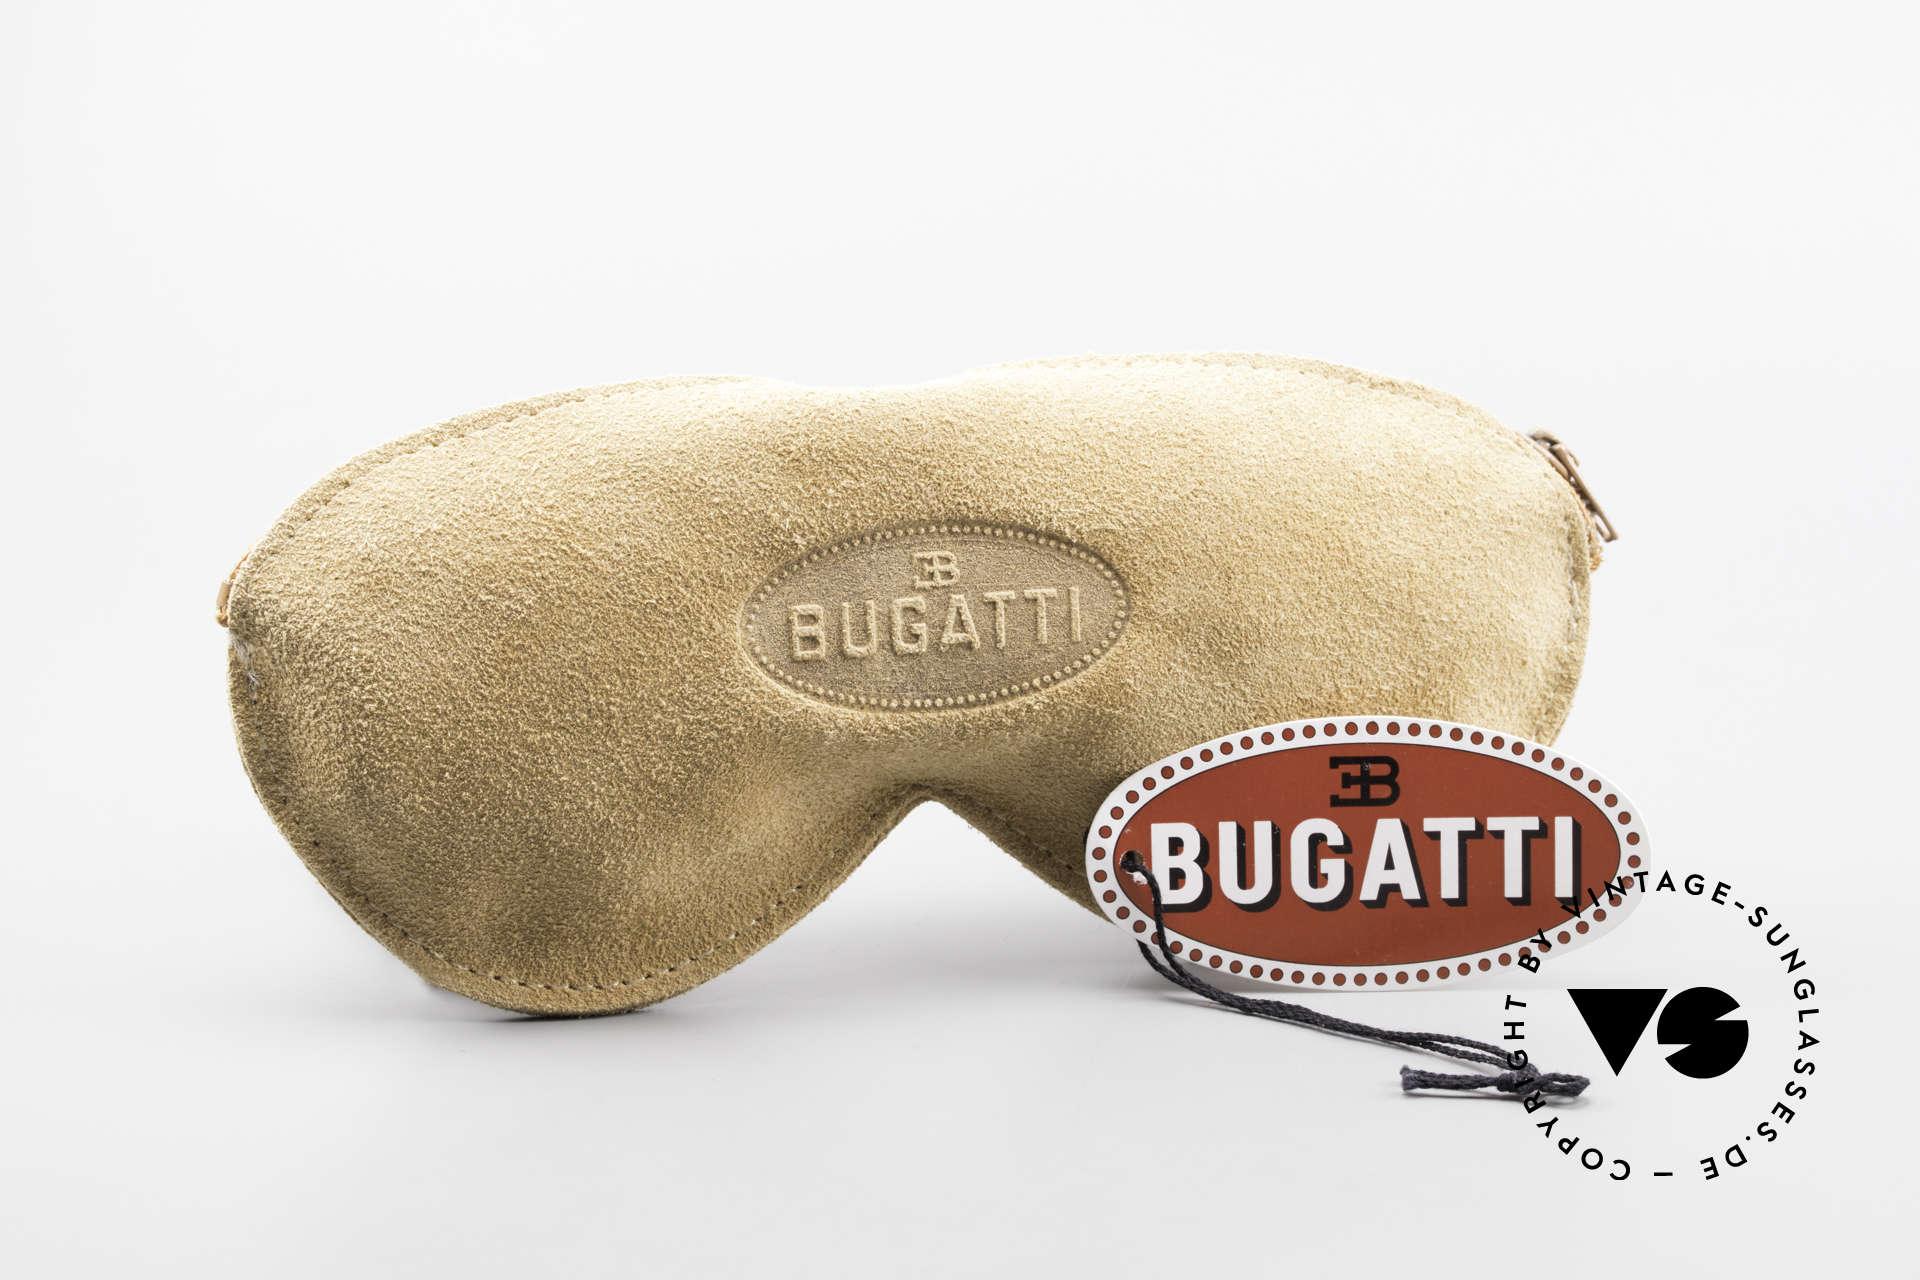 Bugatti 64319 80's Sunglasses With Clip On, Size: medium, Made for Men